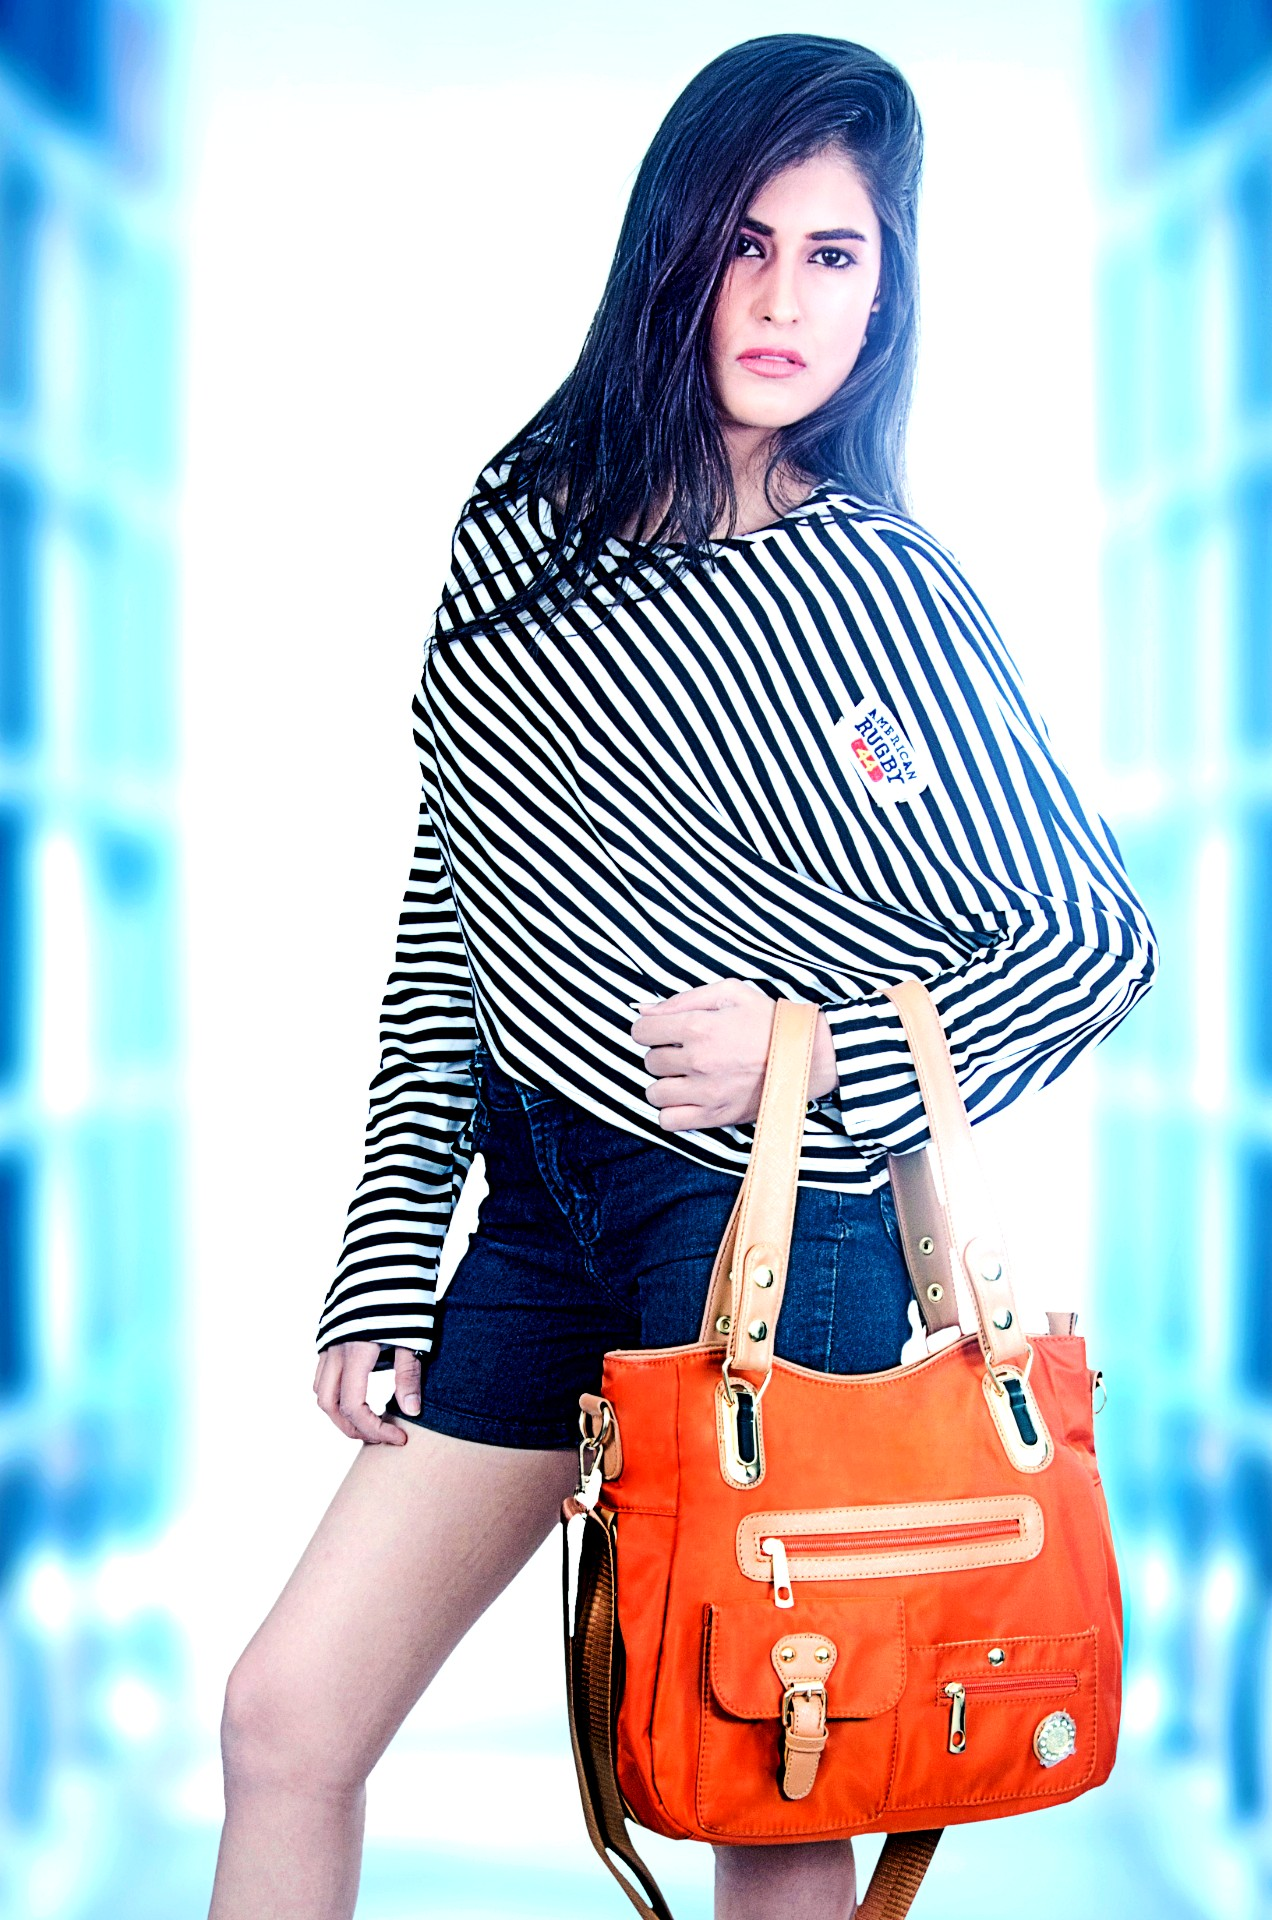 Handbag purse woman faux leather